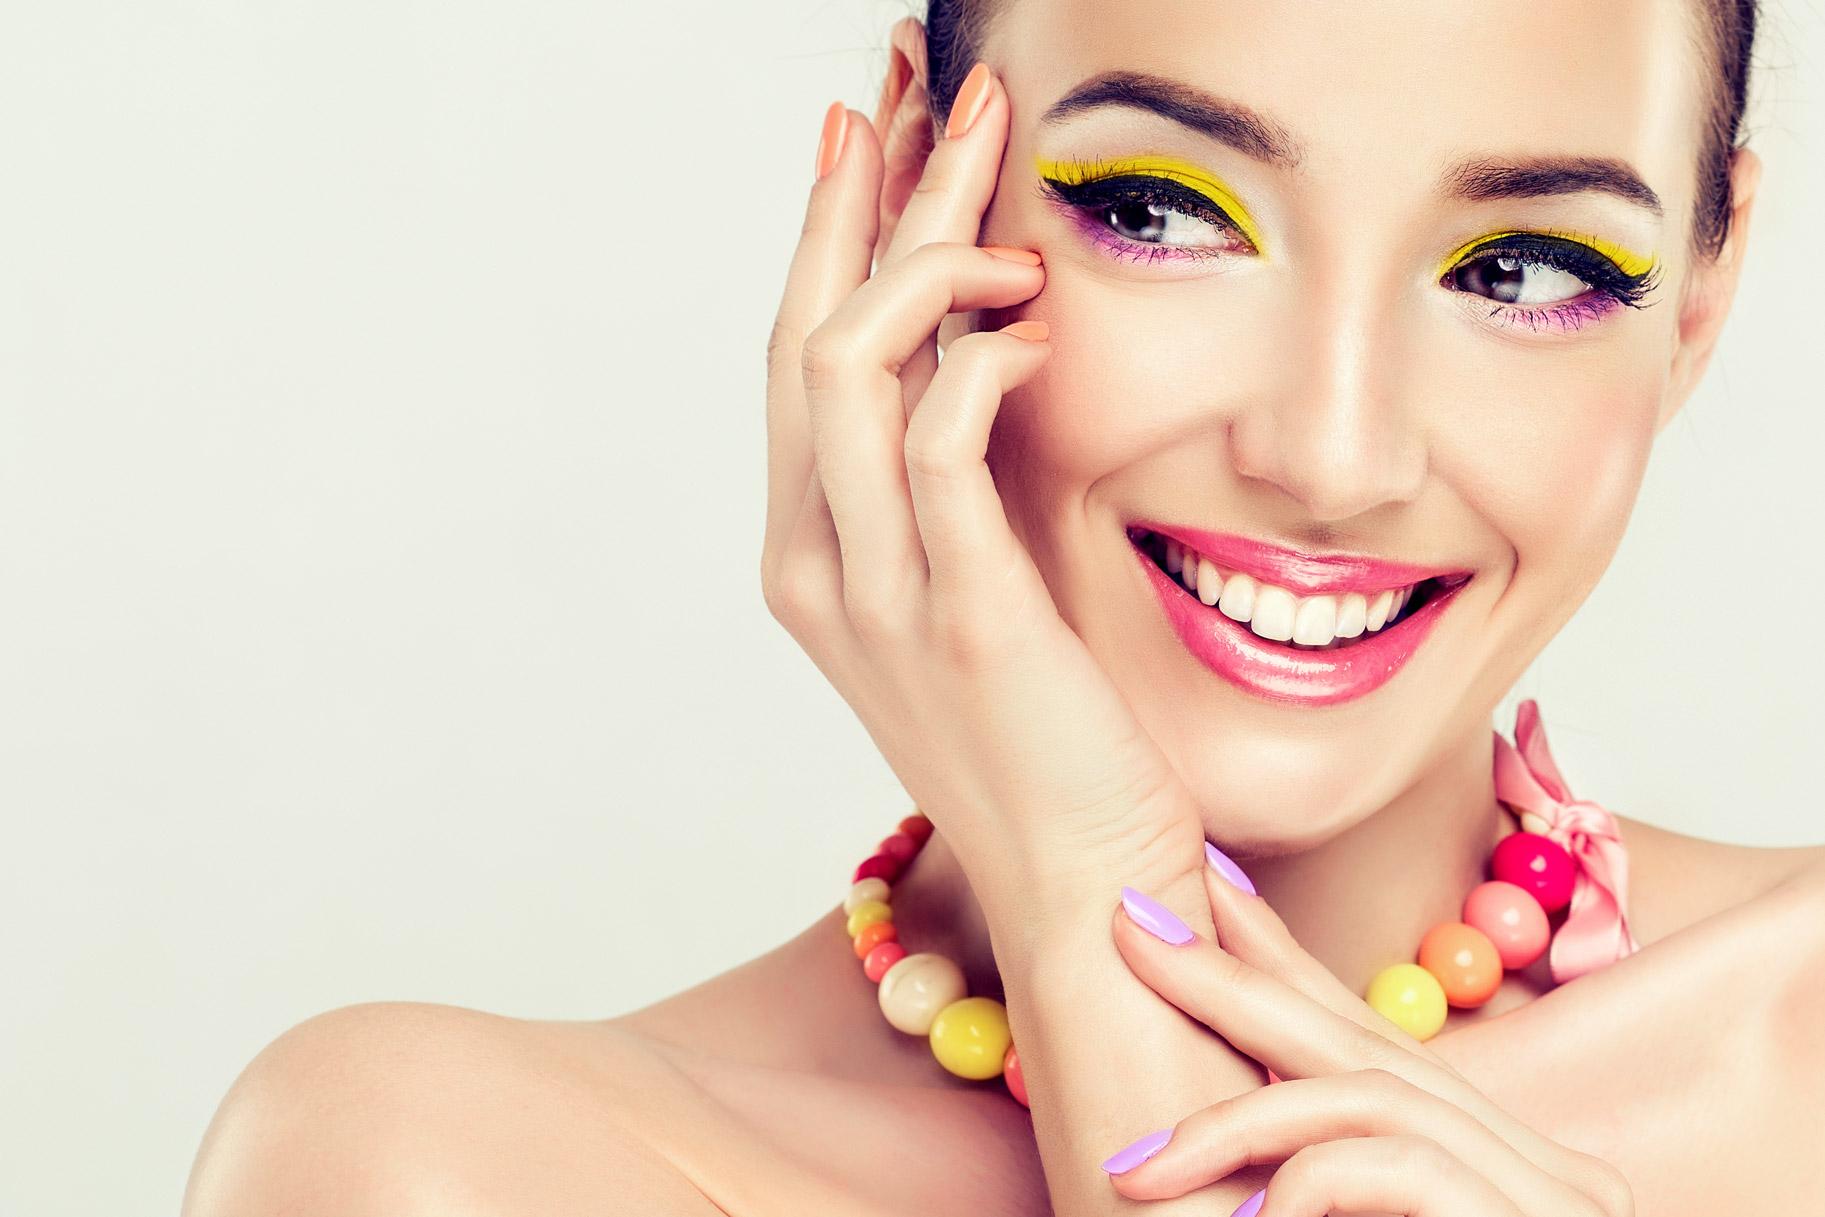 Top 5 Makeup Trends That Will Rock 2018